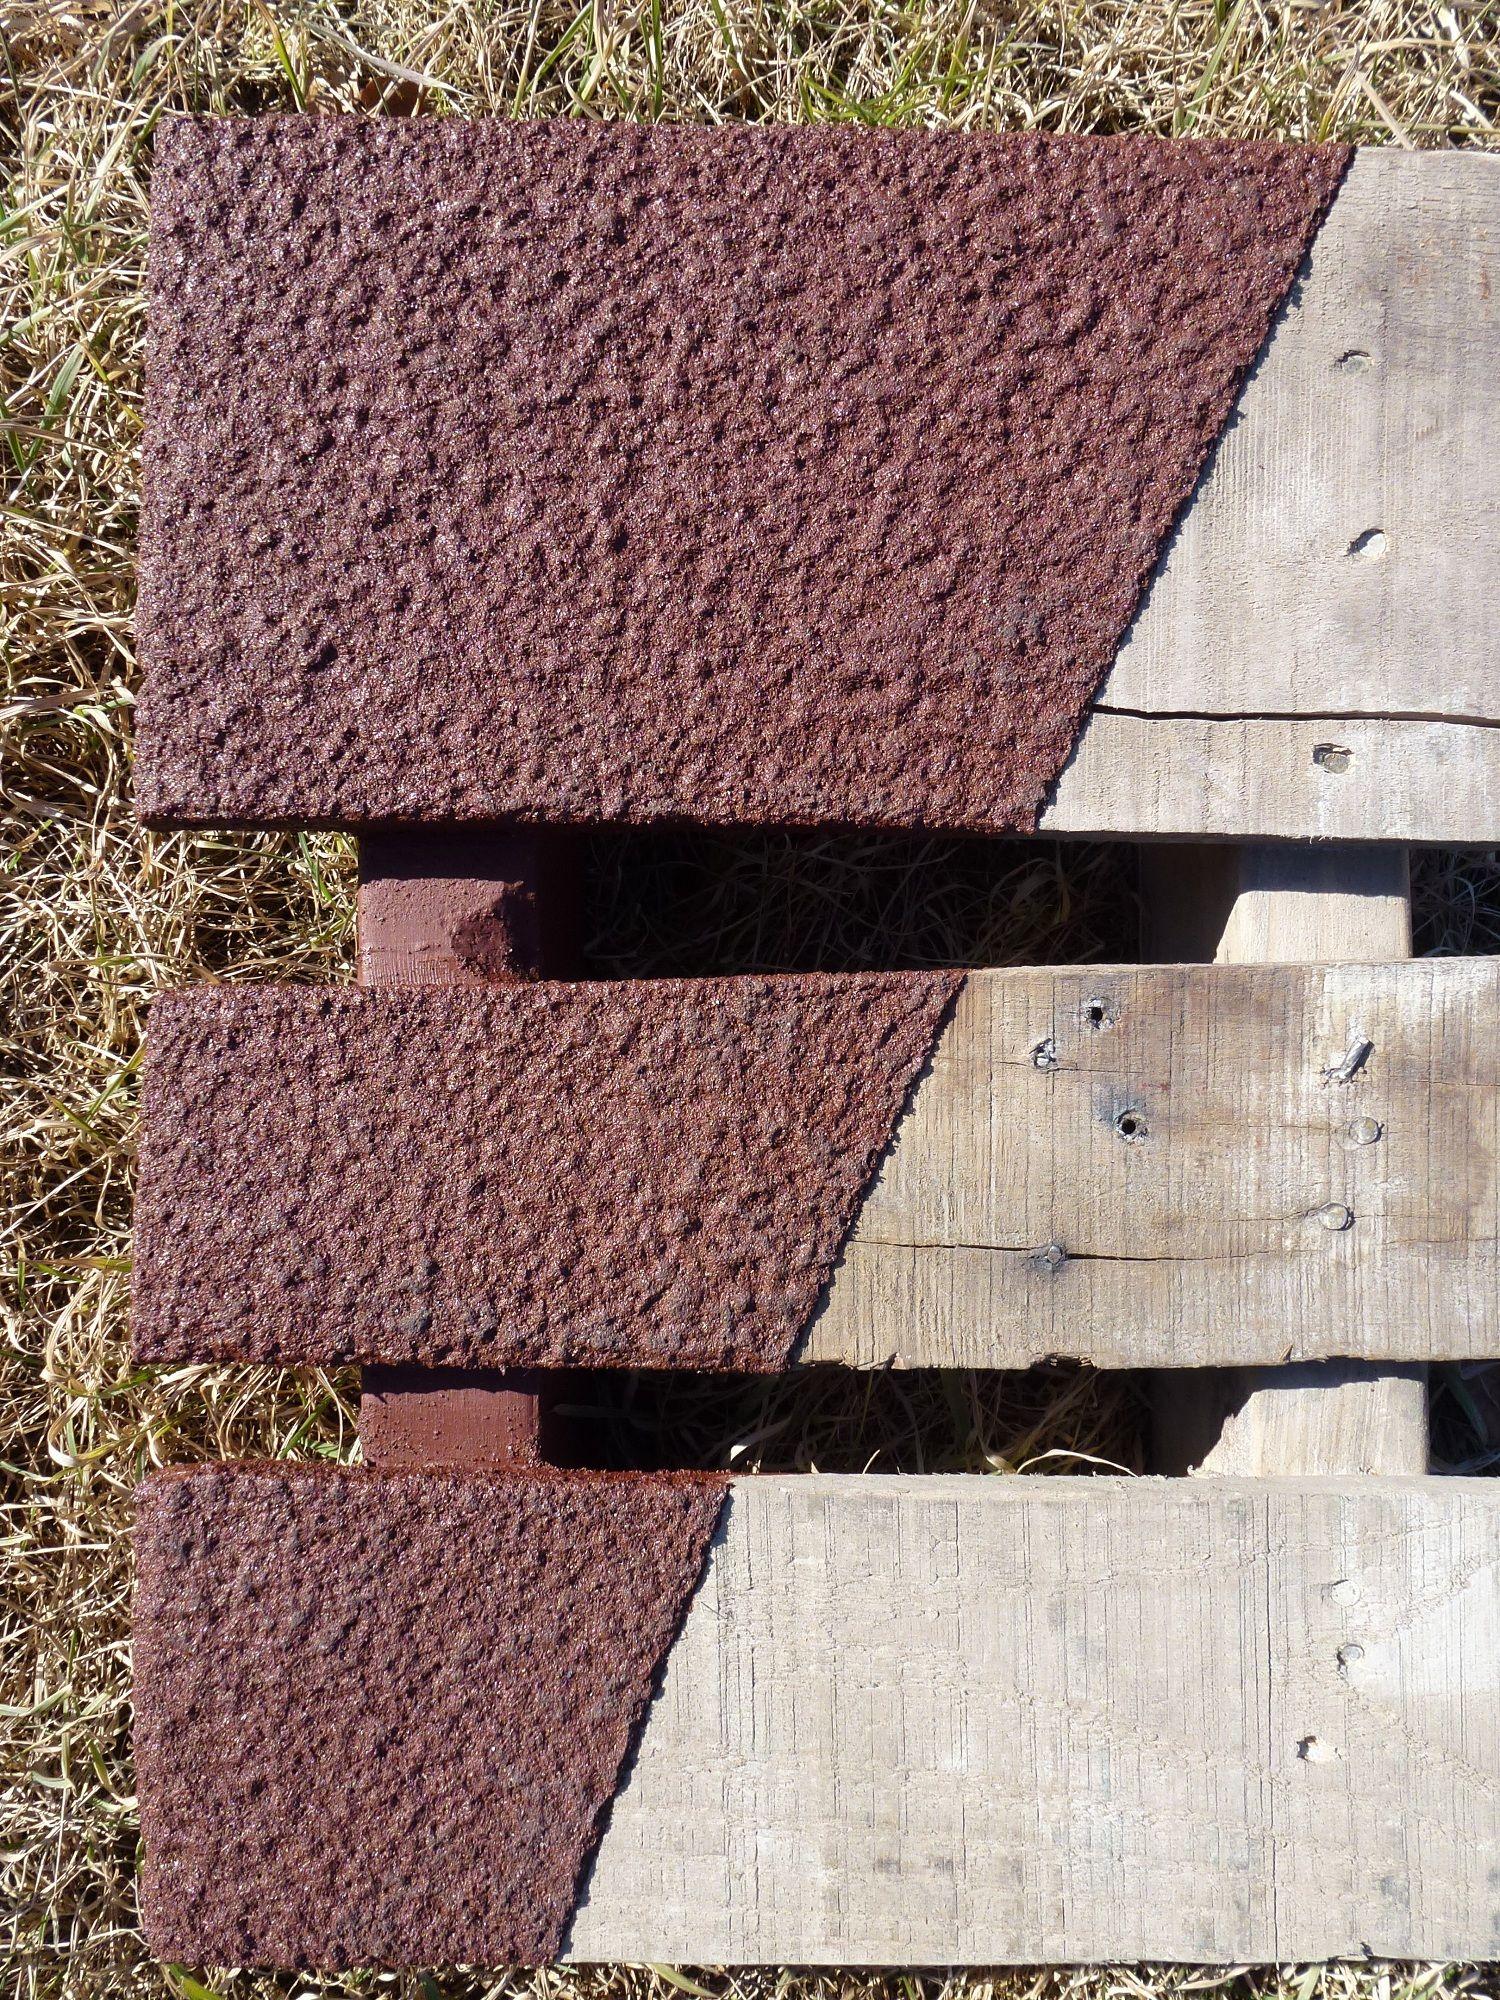 Armorrenew Concrete Amp Wood Resurfacer Deck Patio